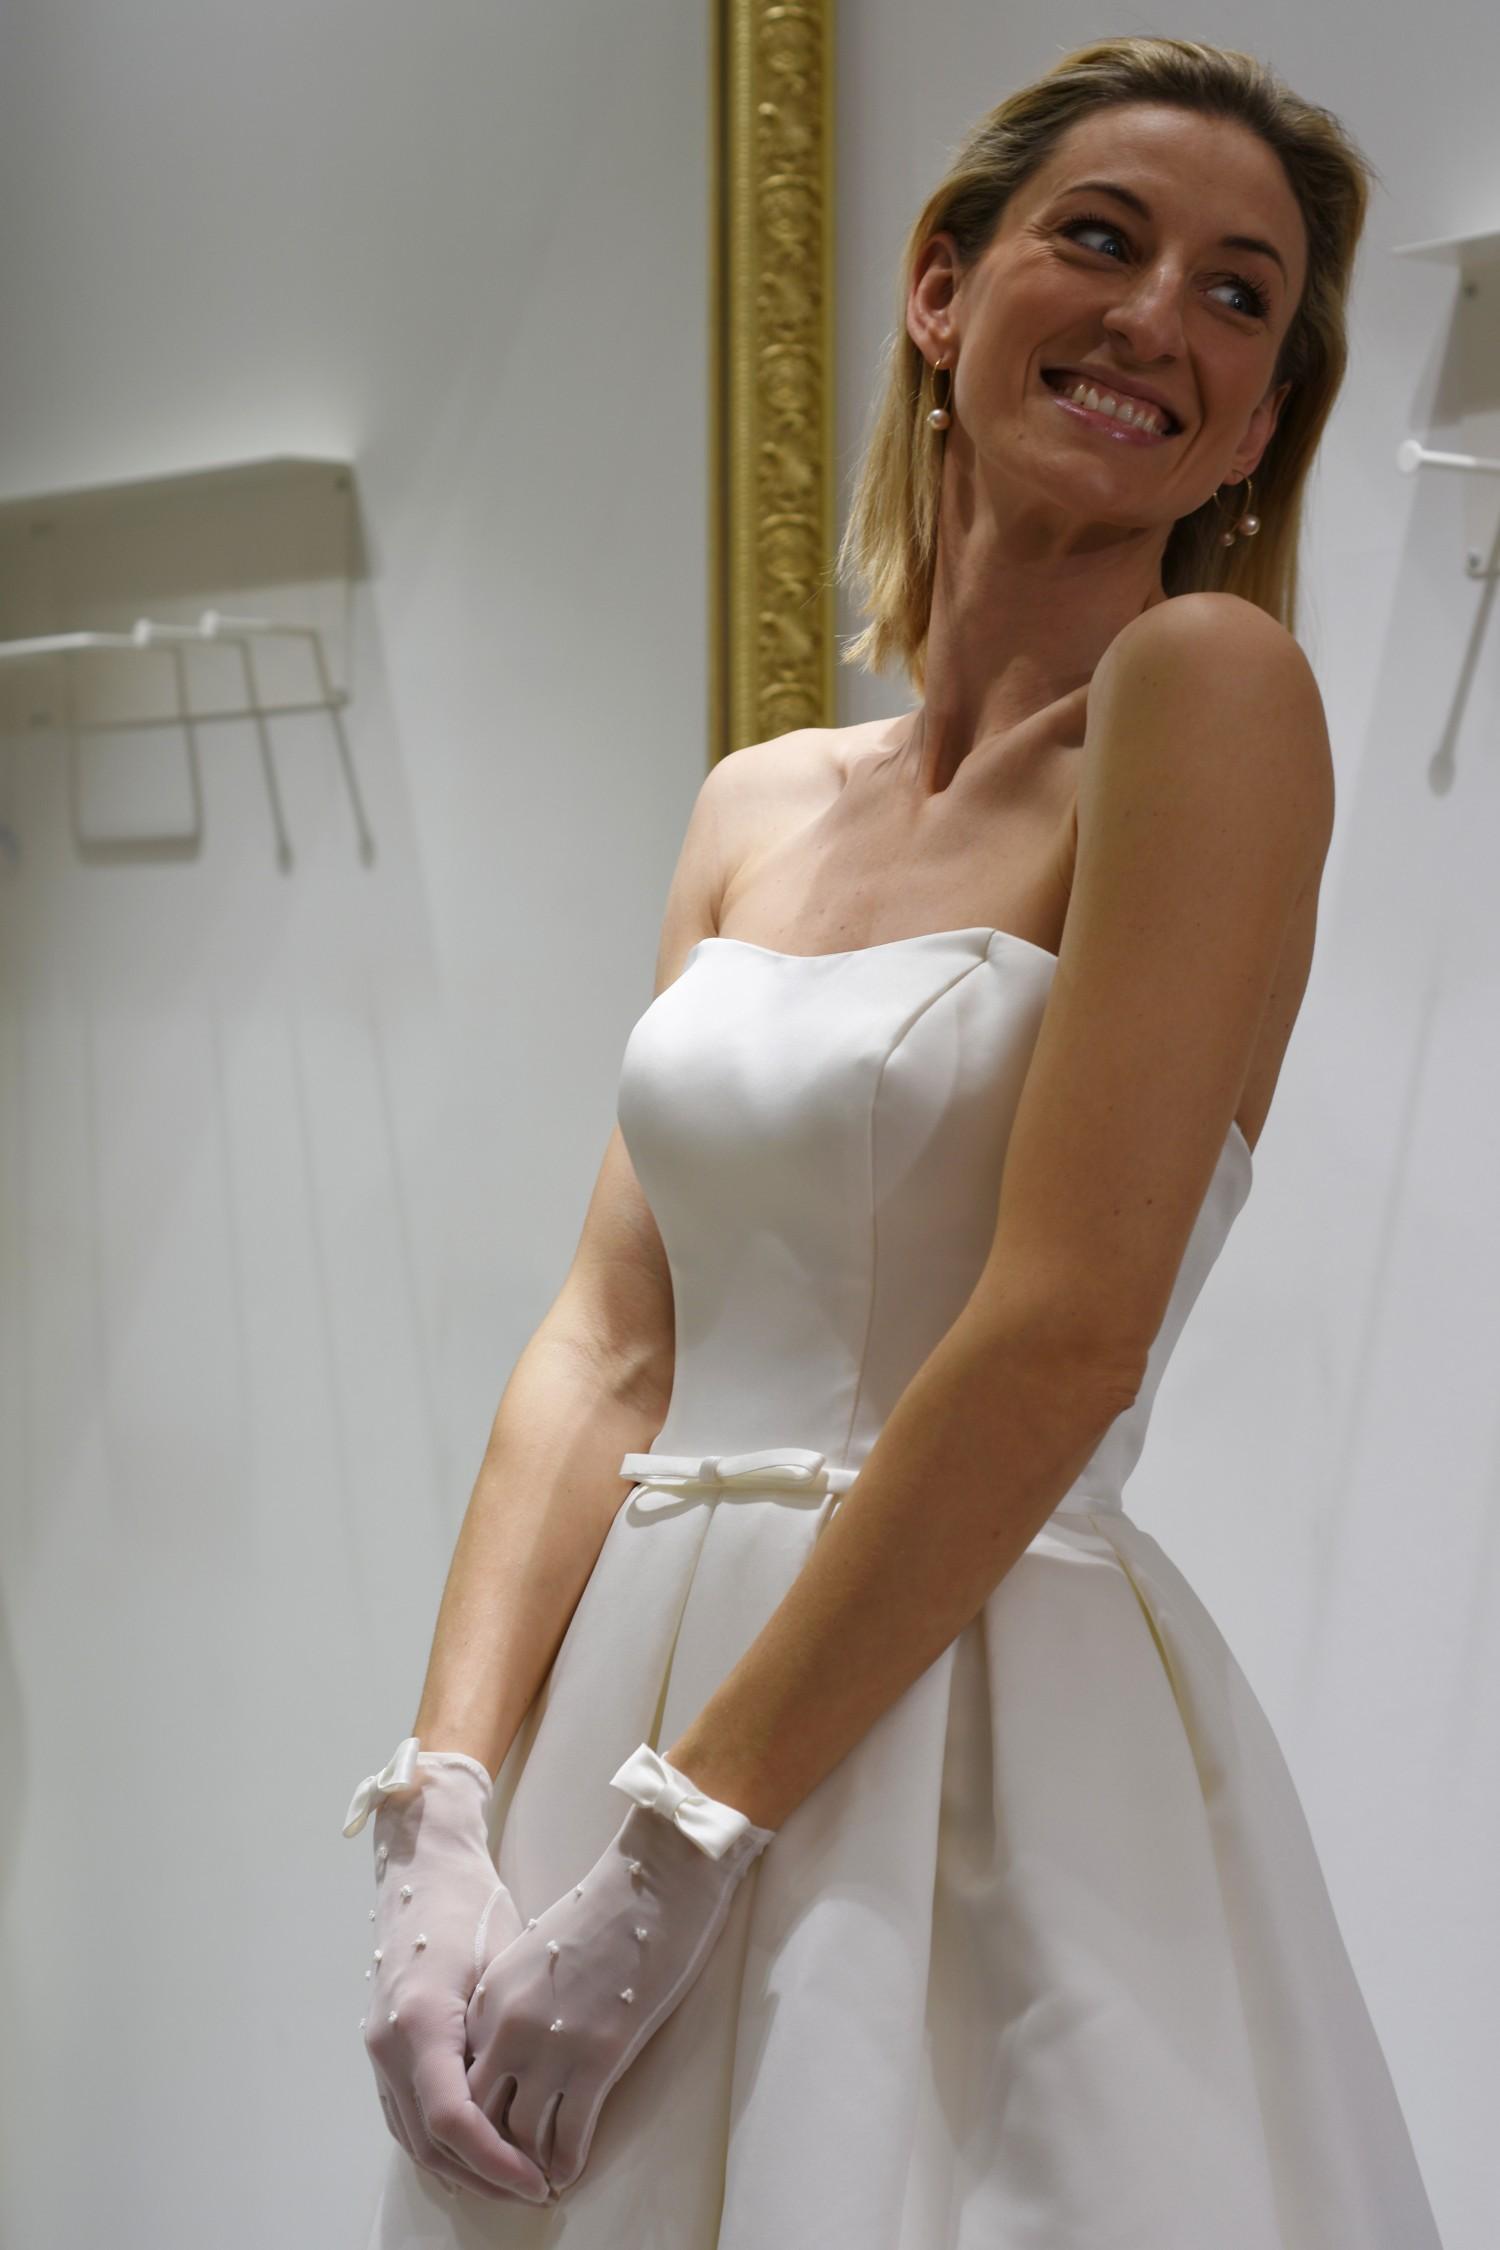 lilly-brudekjoler-annemette-voss-42